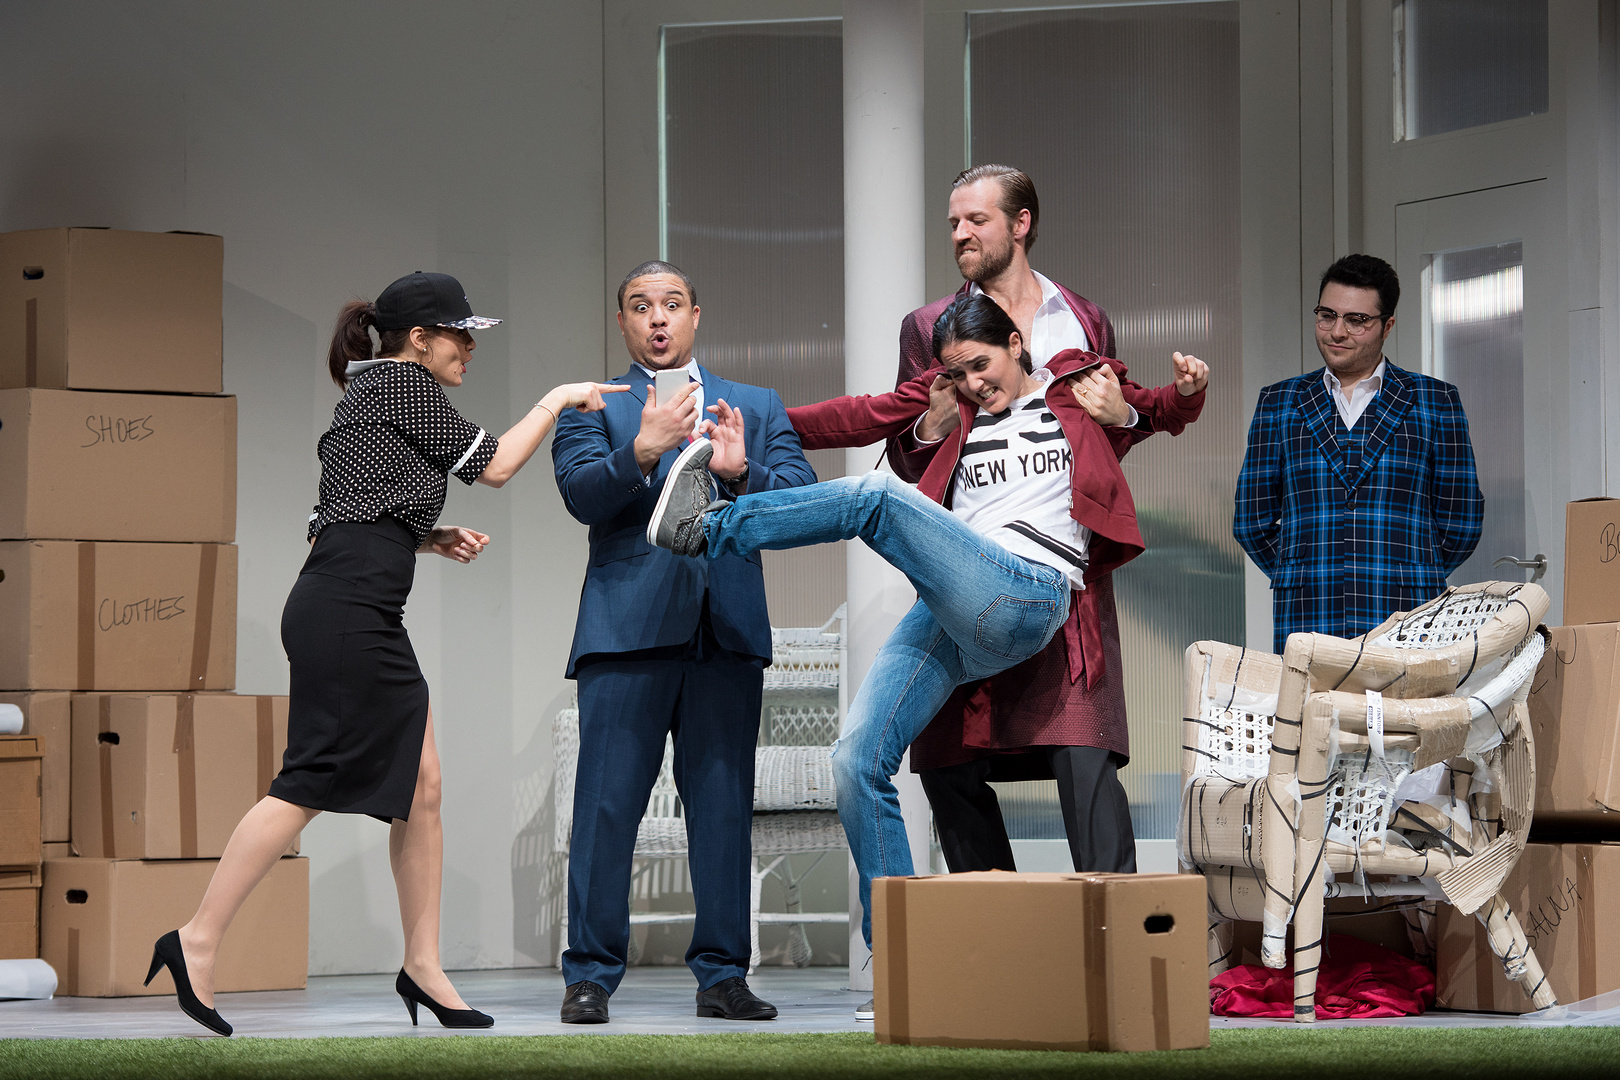 Le-Nozze-di-Figaro-Opera-by-Mozart-Opera-Director-Jacopo-Spirei-Salzburger-Landestheater-2018-4